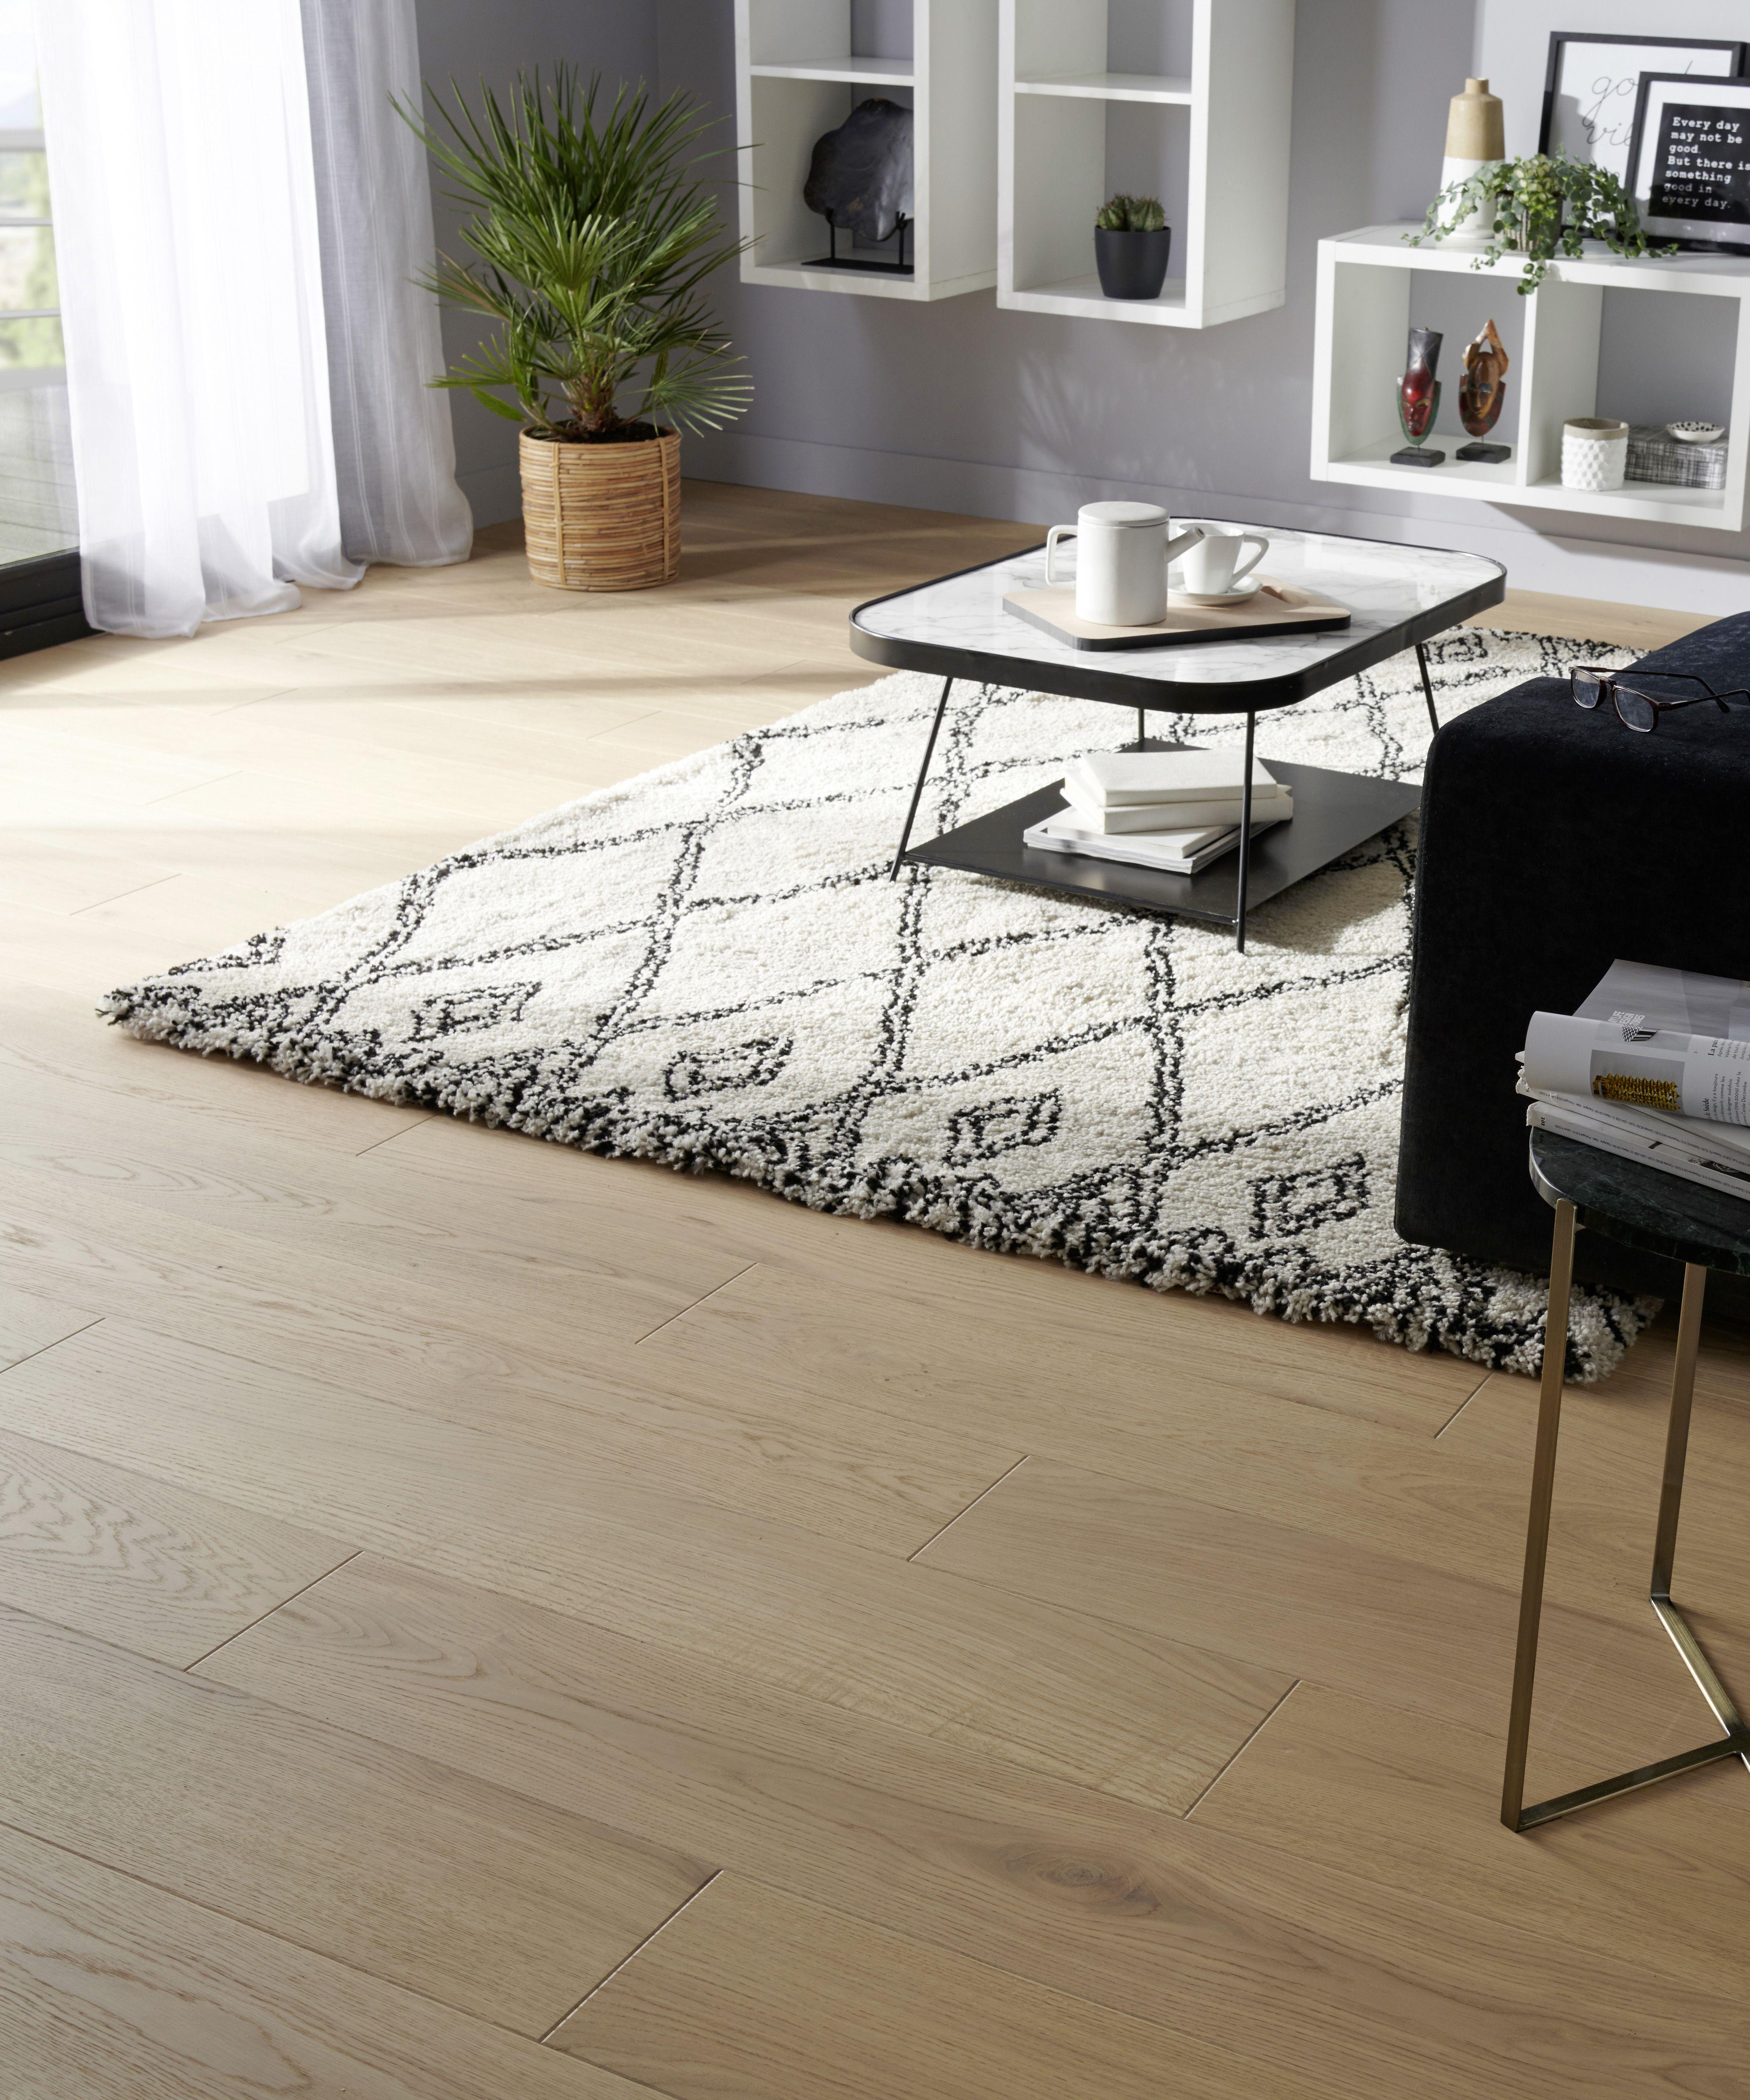 Deska Trojwarstwowa Goodhome Dab Halland 1 37 M2 Deski Trojwarstwowe Simple Living Room Designs Goodhome Living Room Designs